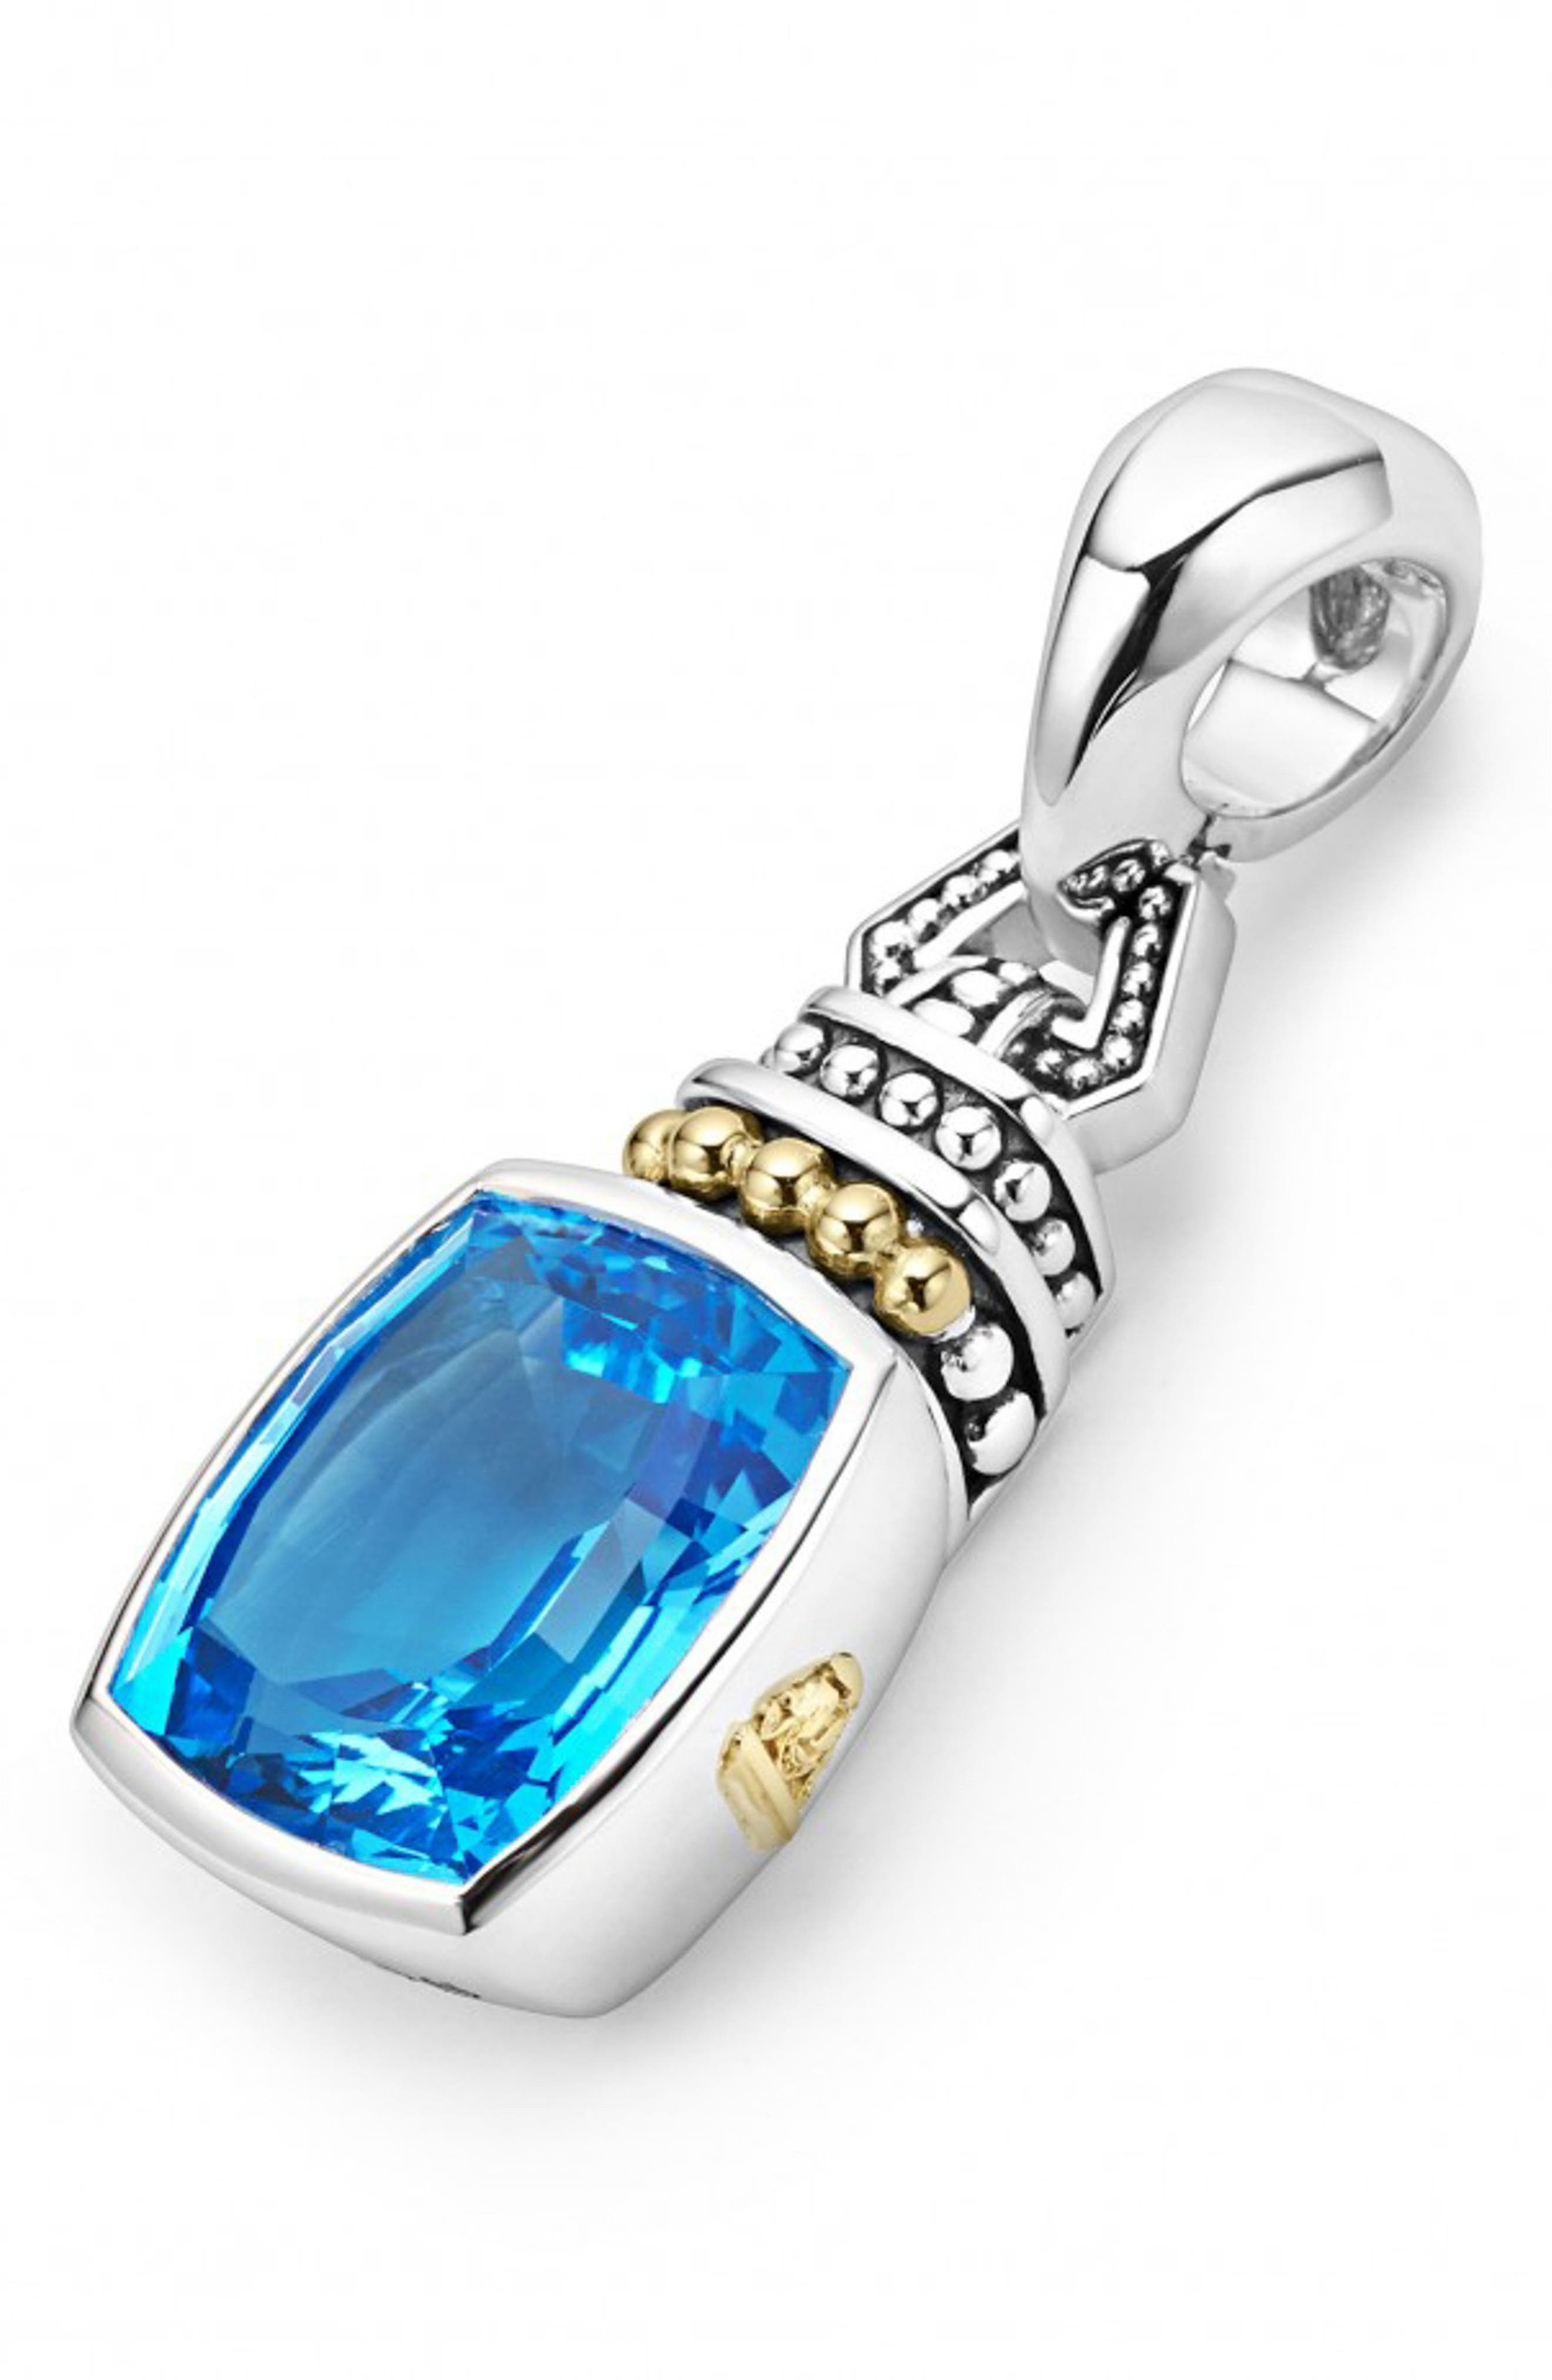 'Caviar Color' Semiprecious Stone Clip Pendant,                             Main thumbnail 1, color,                             BLUE TOPAZ